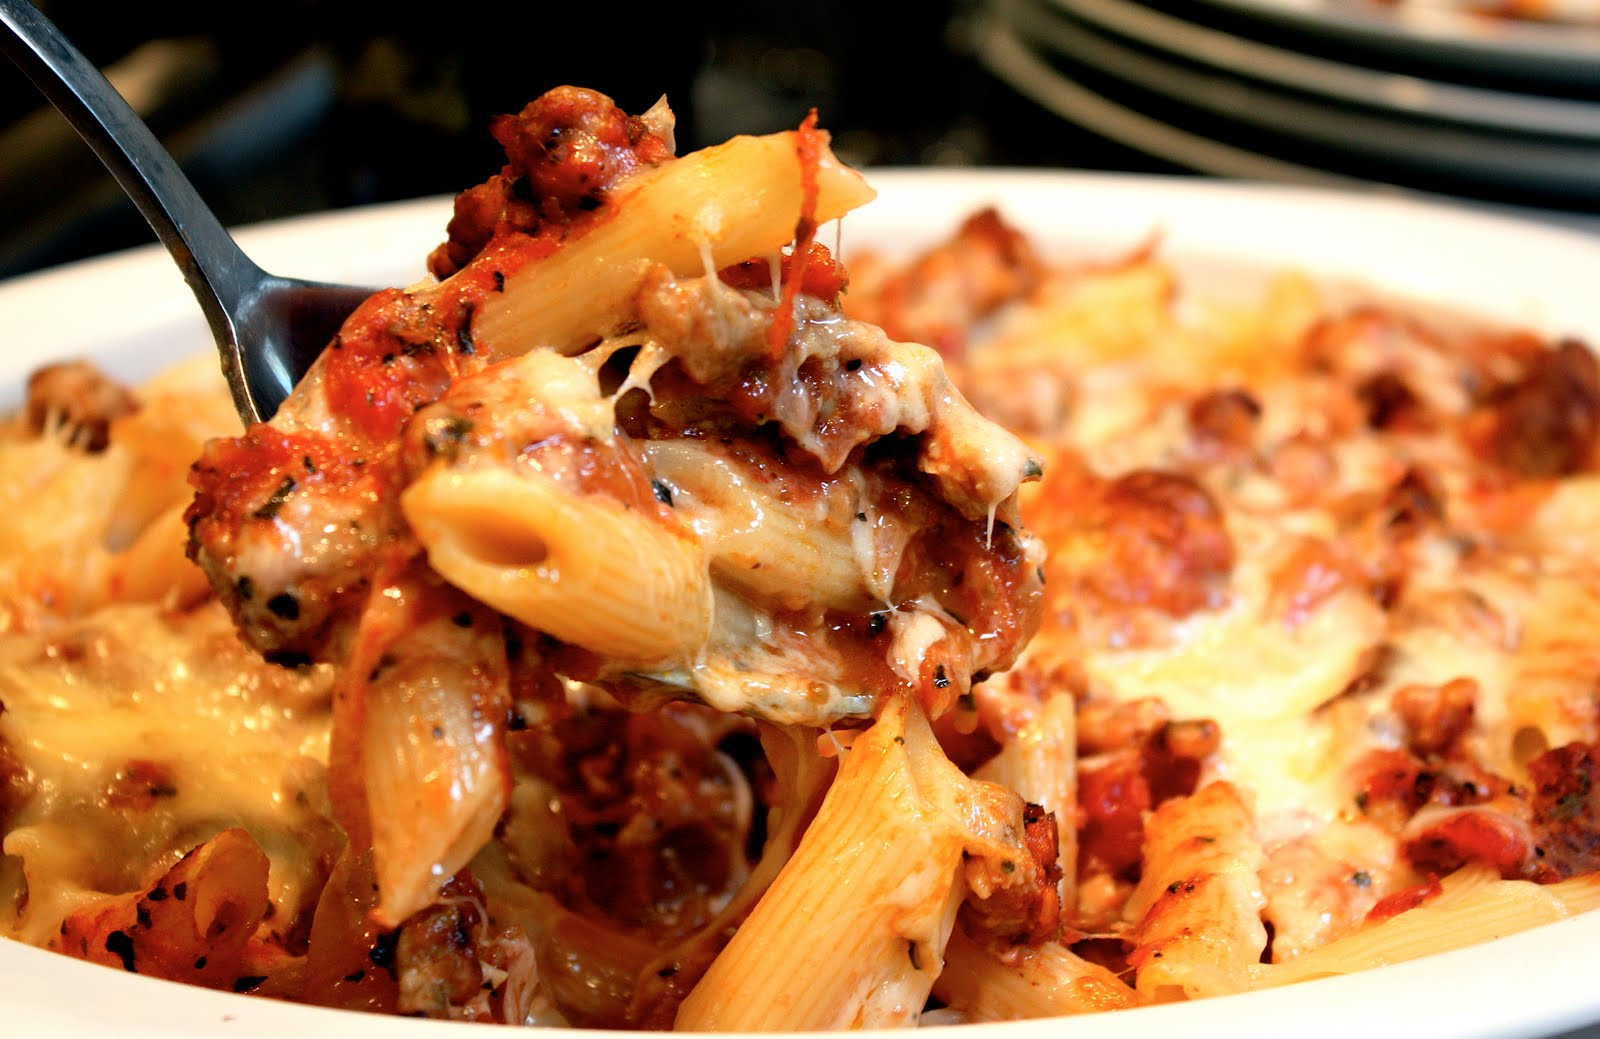 pound penne rigate pasta (I used an organic durum semolina)